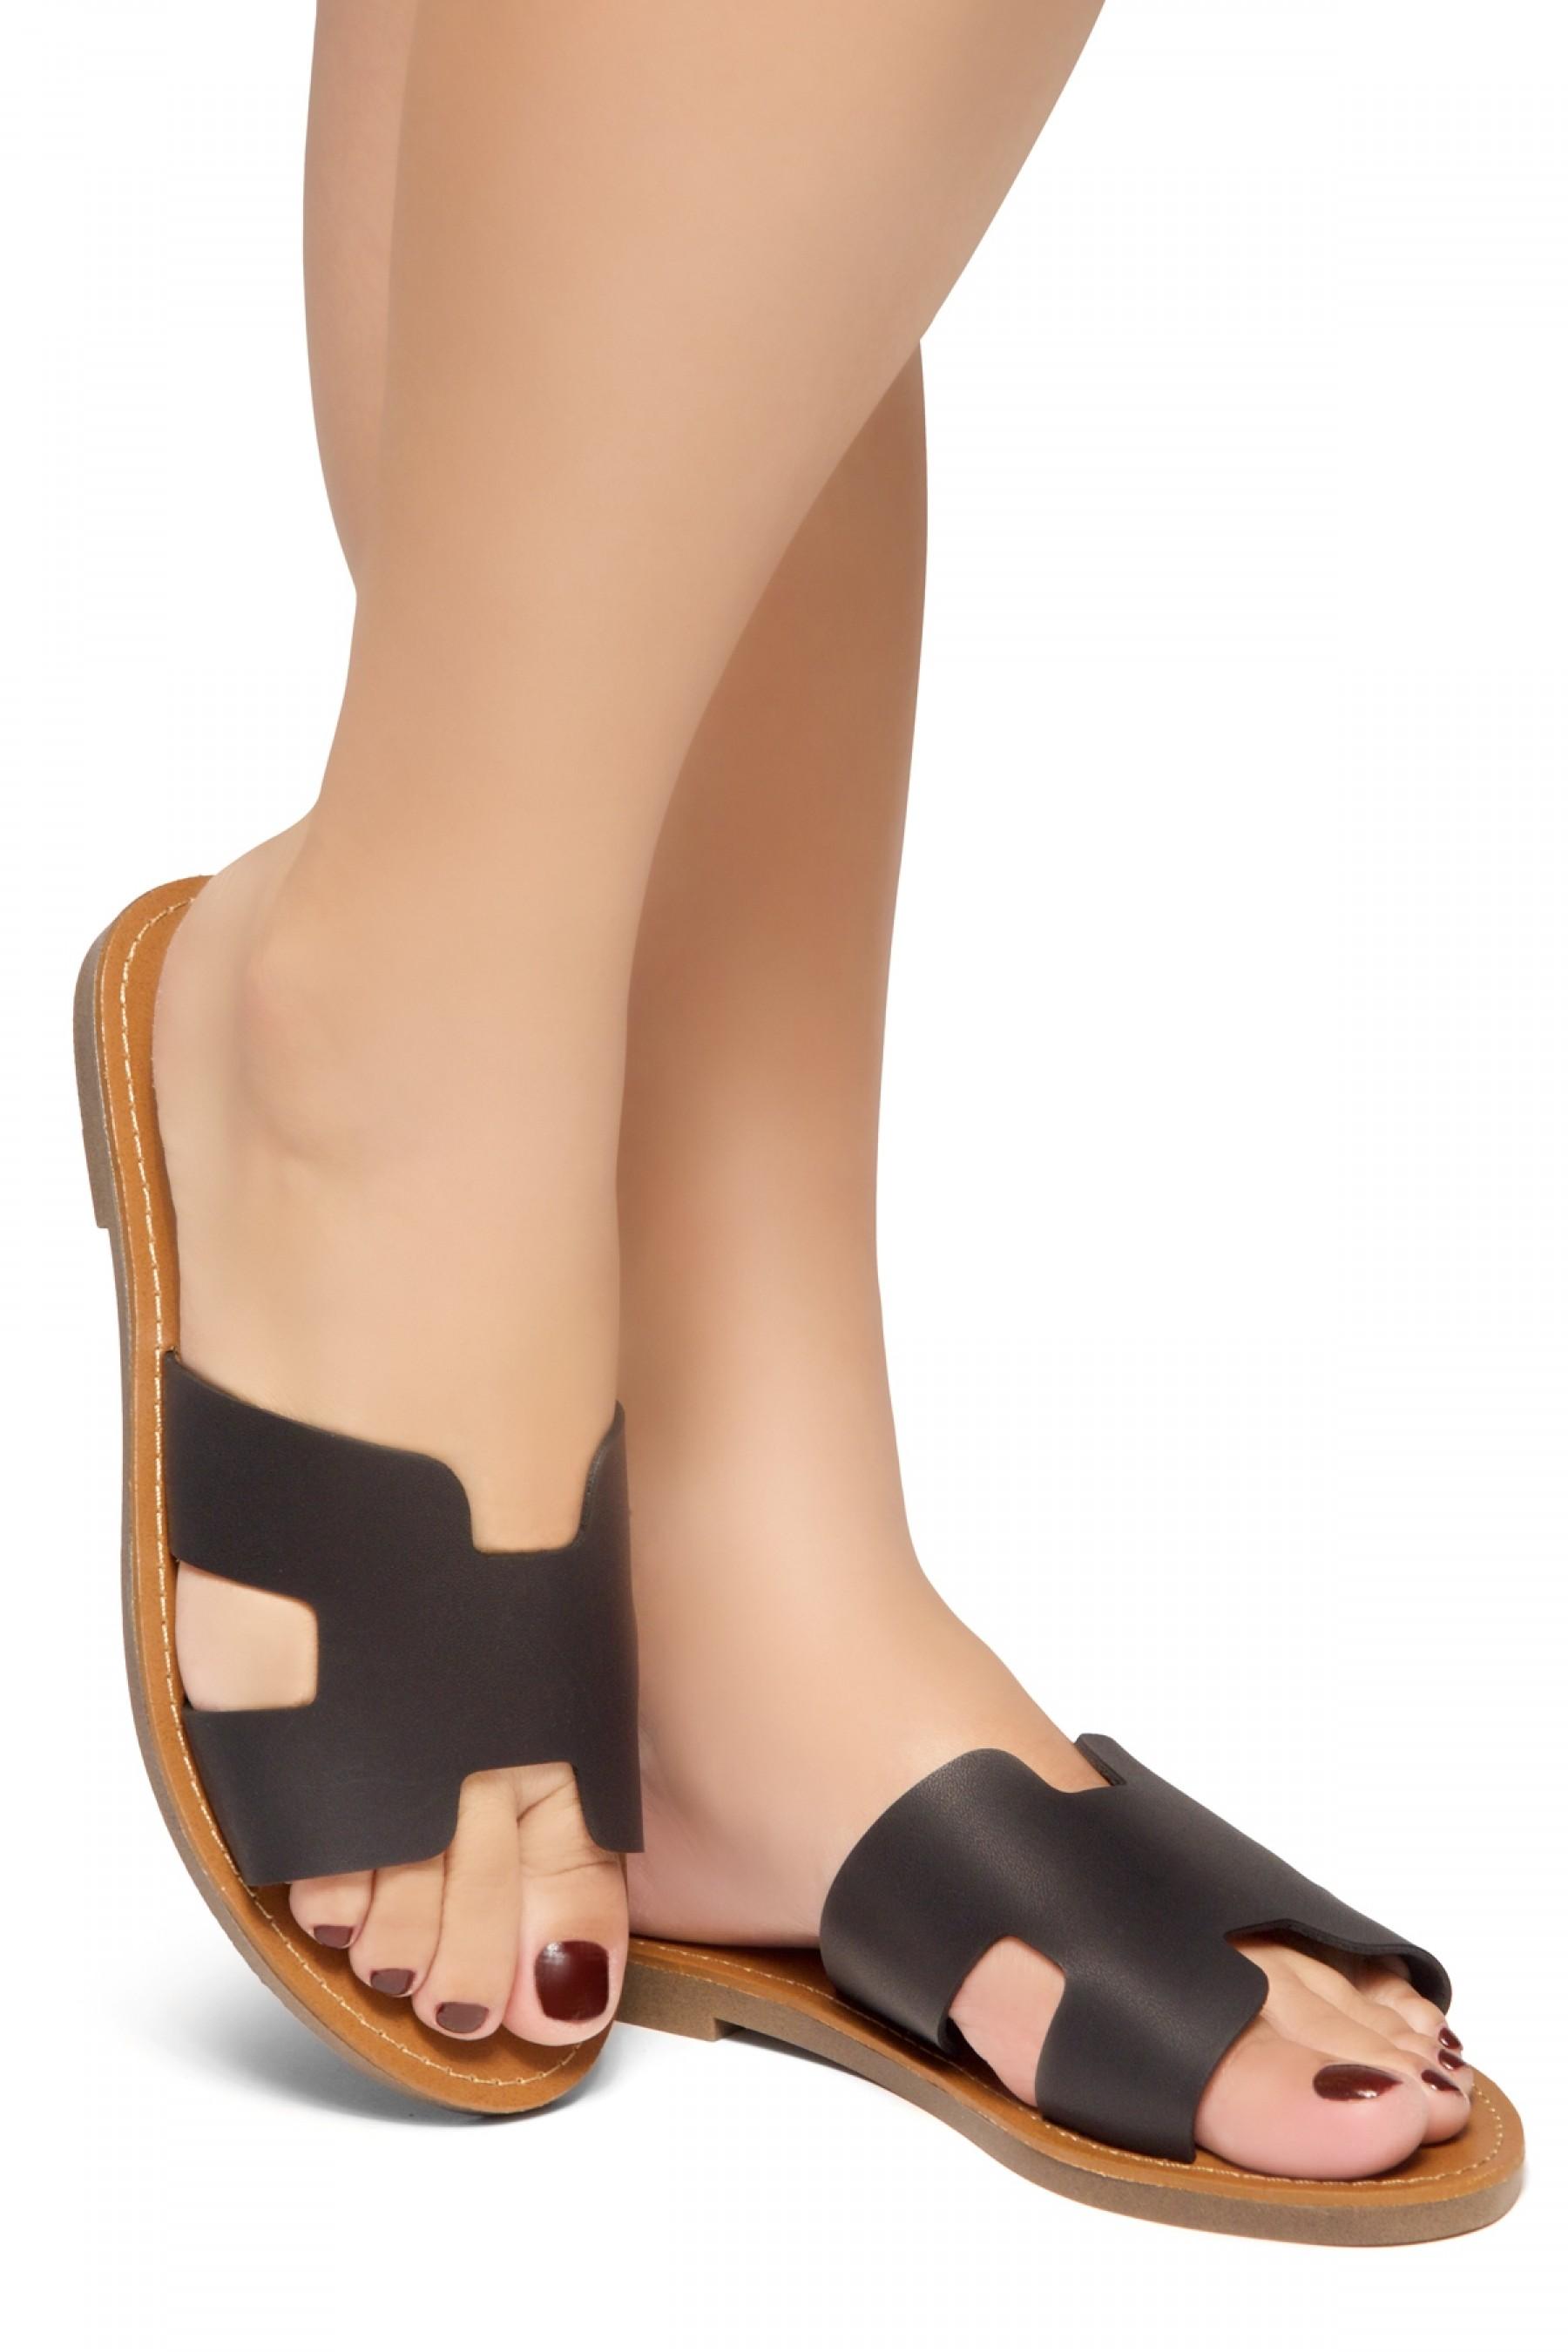 HerStyle Greece- Lightweight Flat Easy Slide-On Sandals (Black)